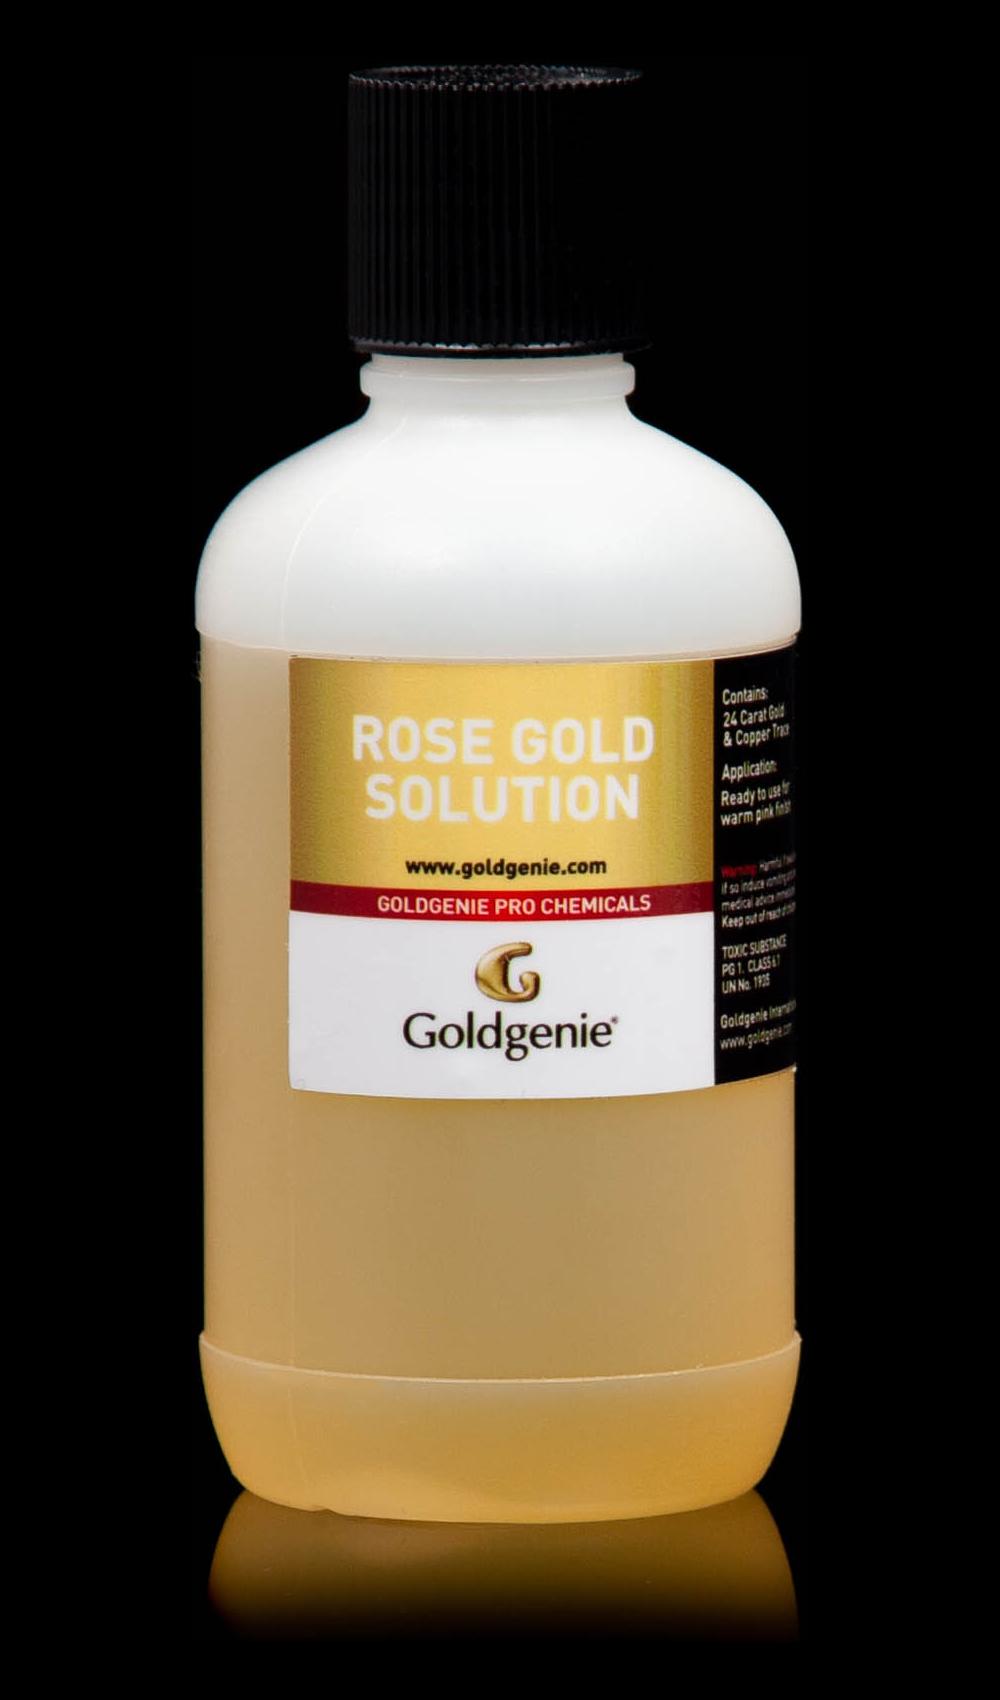 Rose Gold Solution